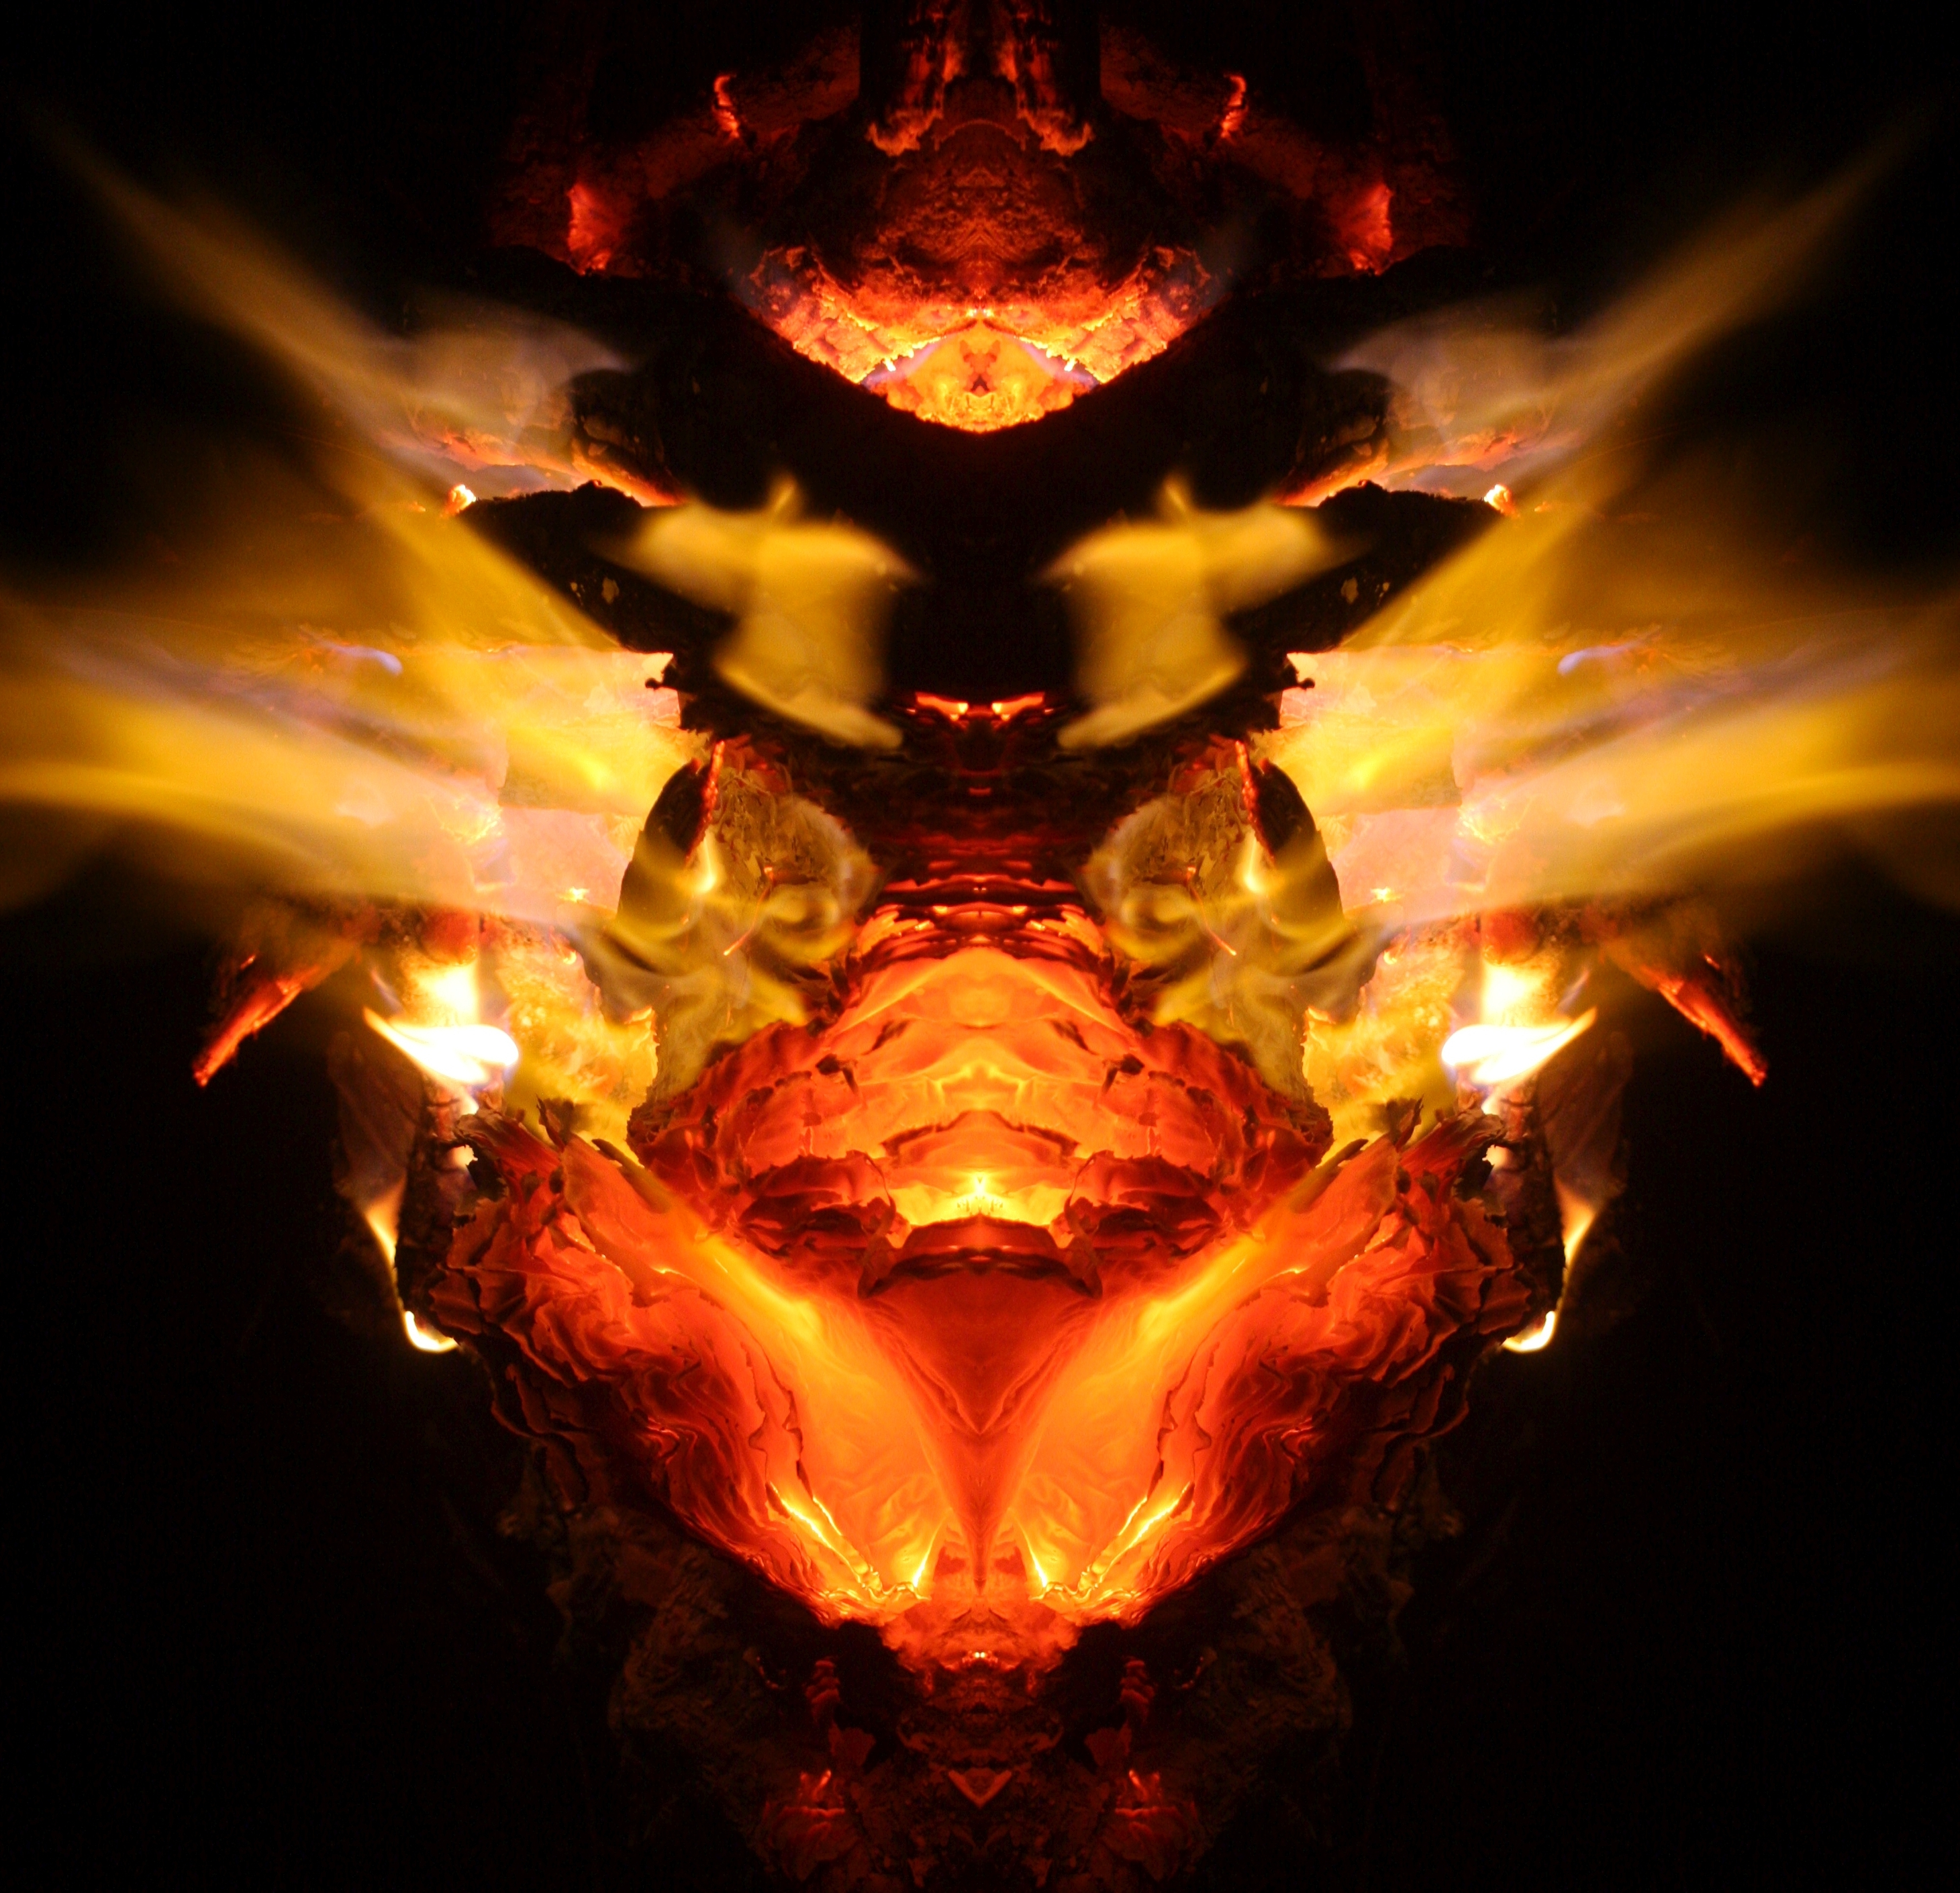 Fire spread2